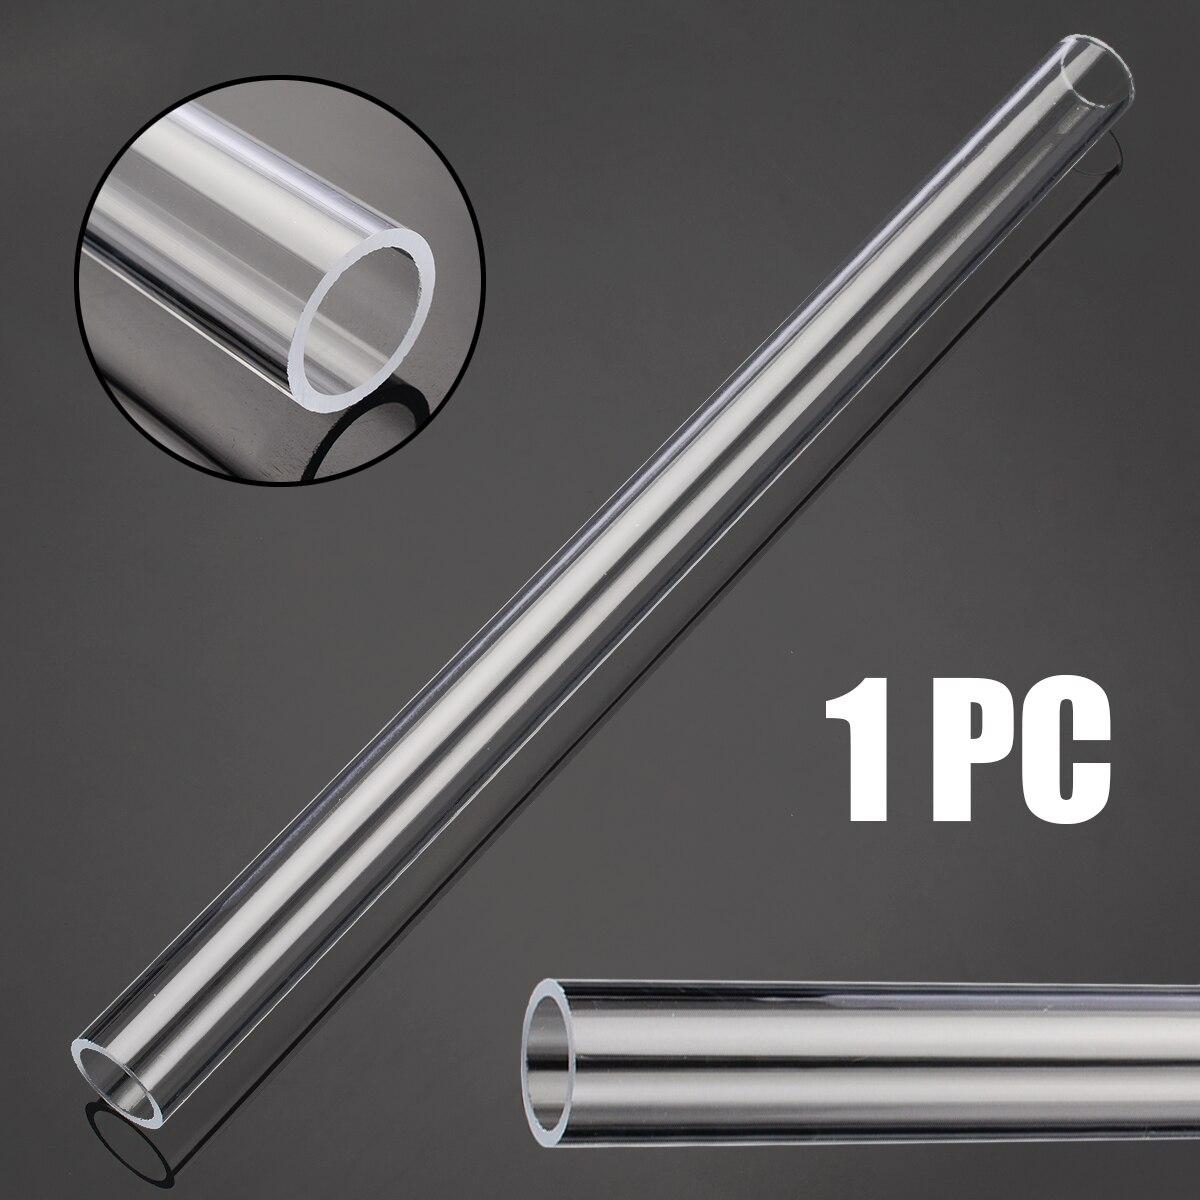 1pc Transparent Acrylic Tube Plexiglass Lucite Tube 300mm Length 20mm OD 16mm ID For Aquarium Fish Fittings